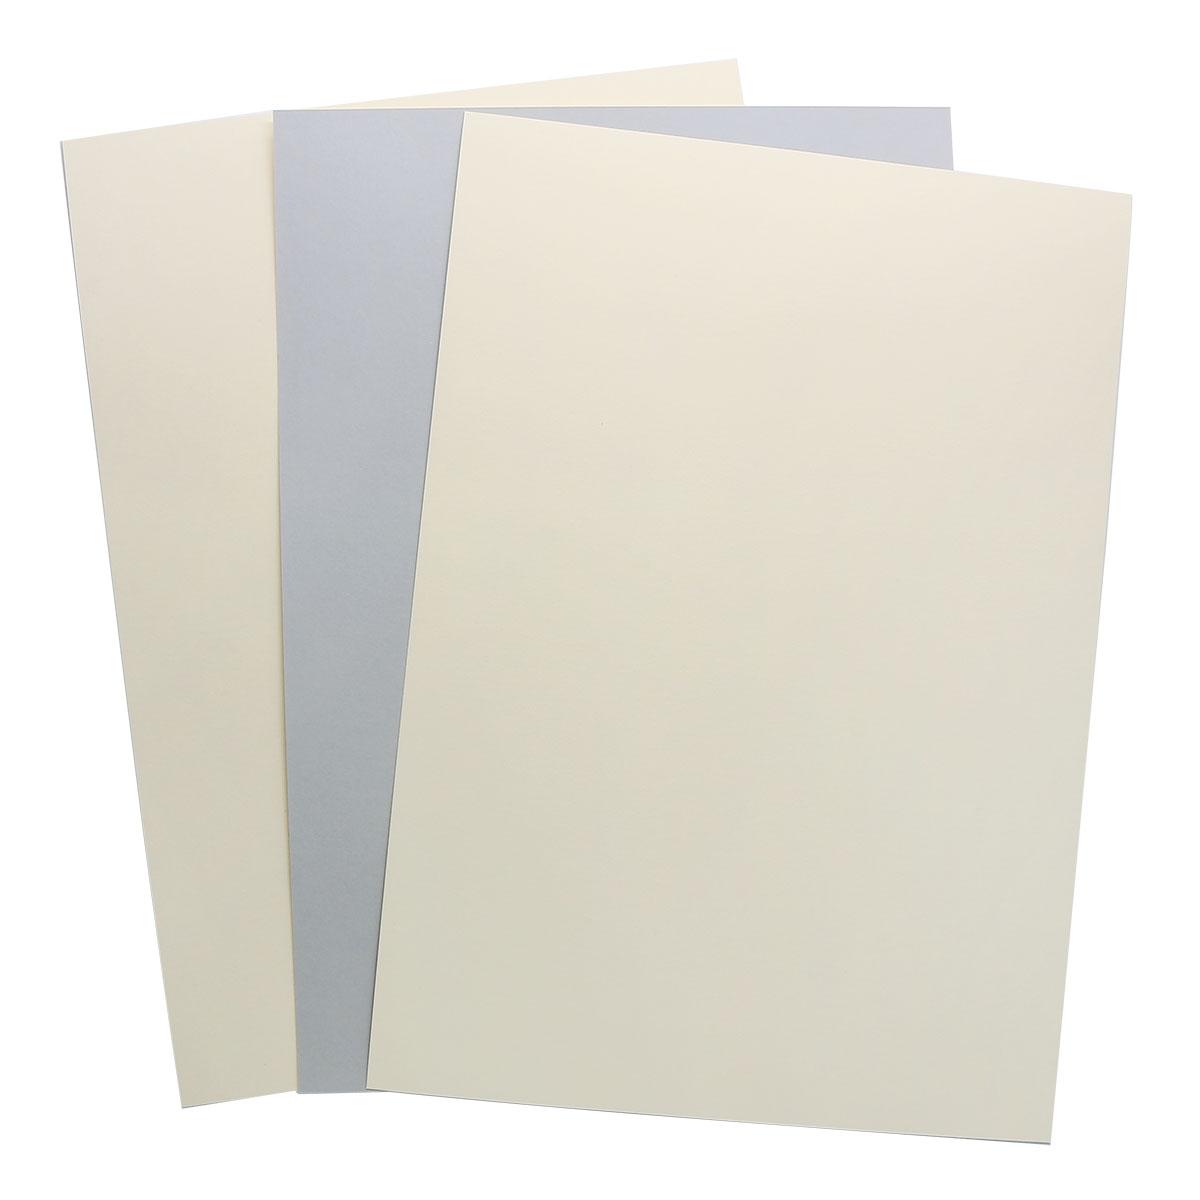 БД0005 Бумага двухсторонняя А4 КОМПЛЕКТ 3шт. Серый/Кремовый